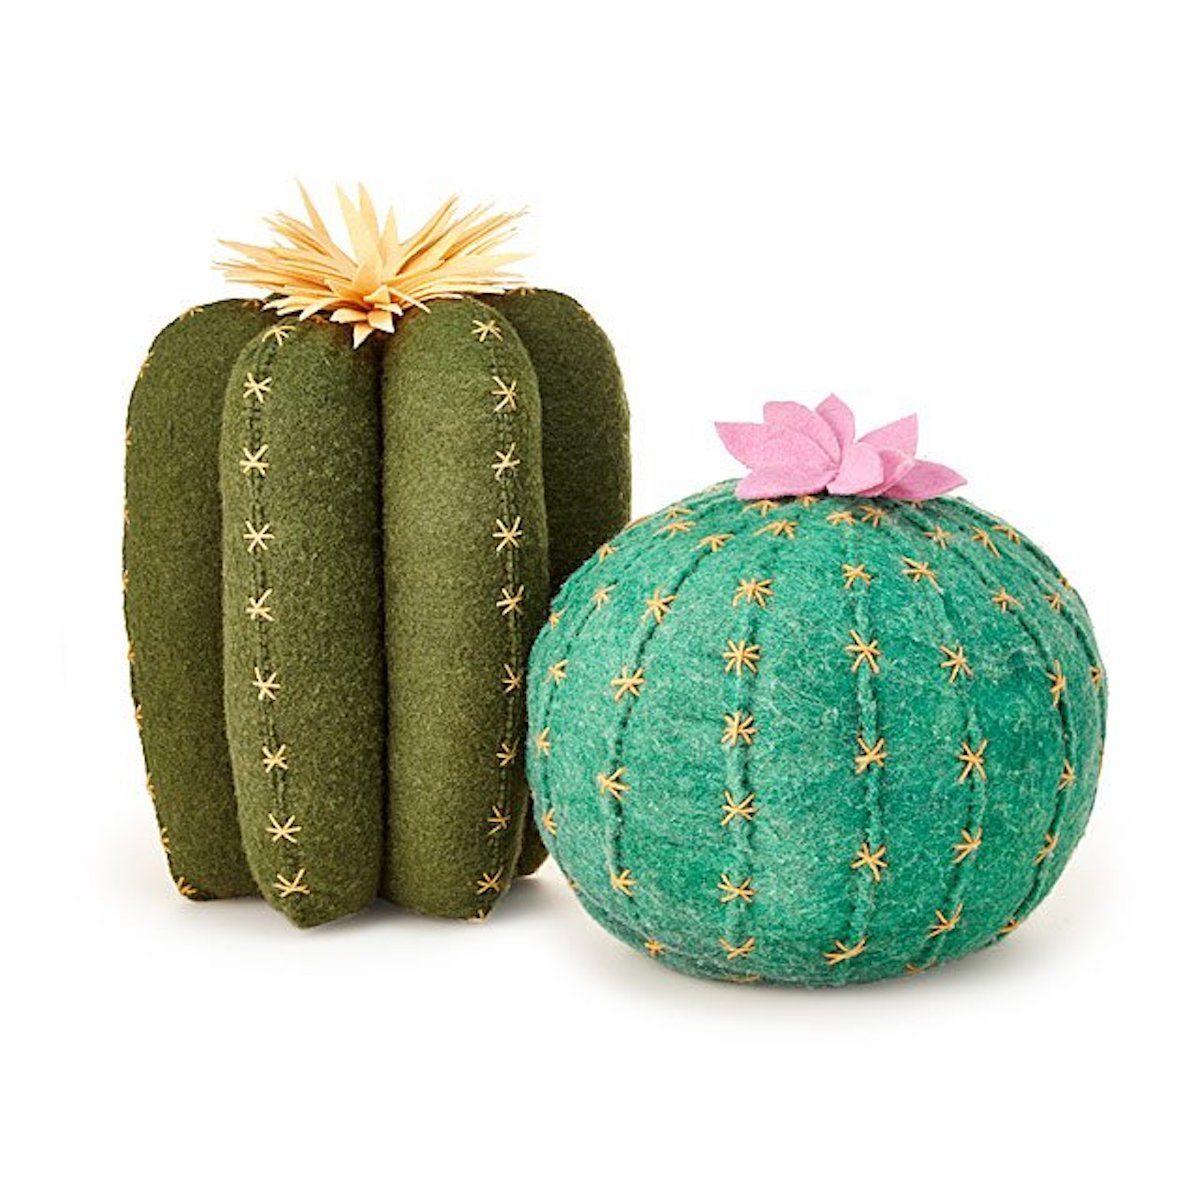 Cactus throw pillows